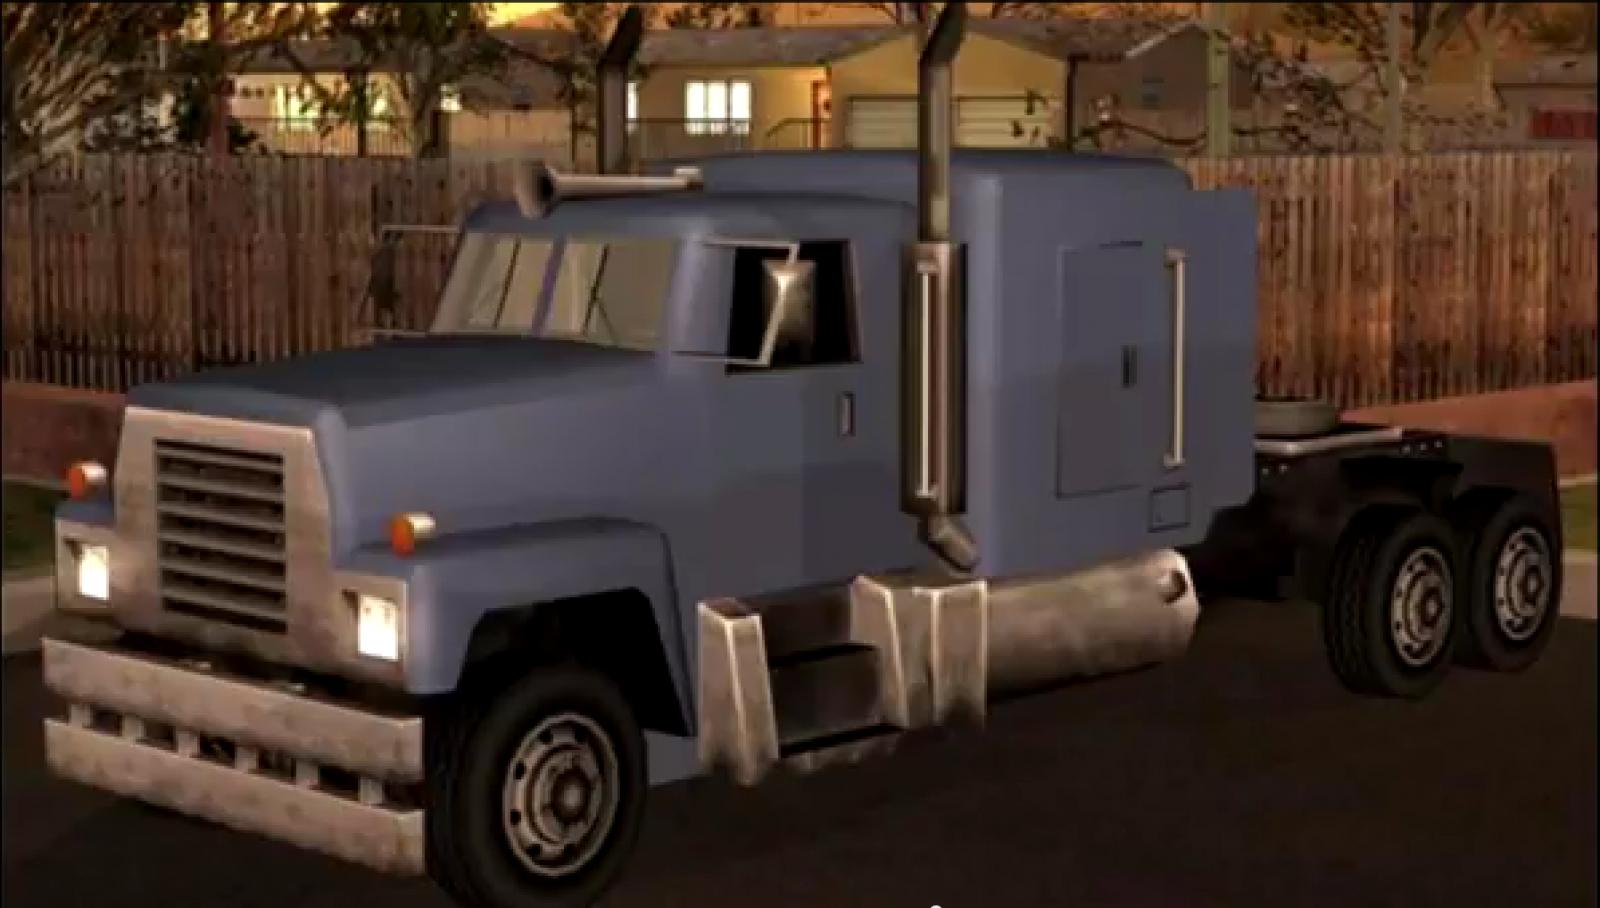 GTA 5 Online Heists: New leaked Heist DLC vehicles revealed